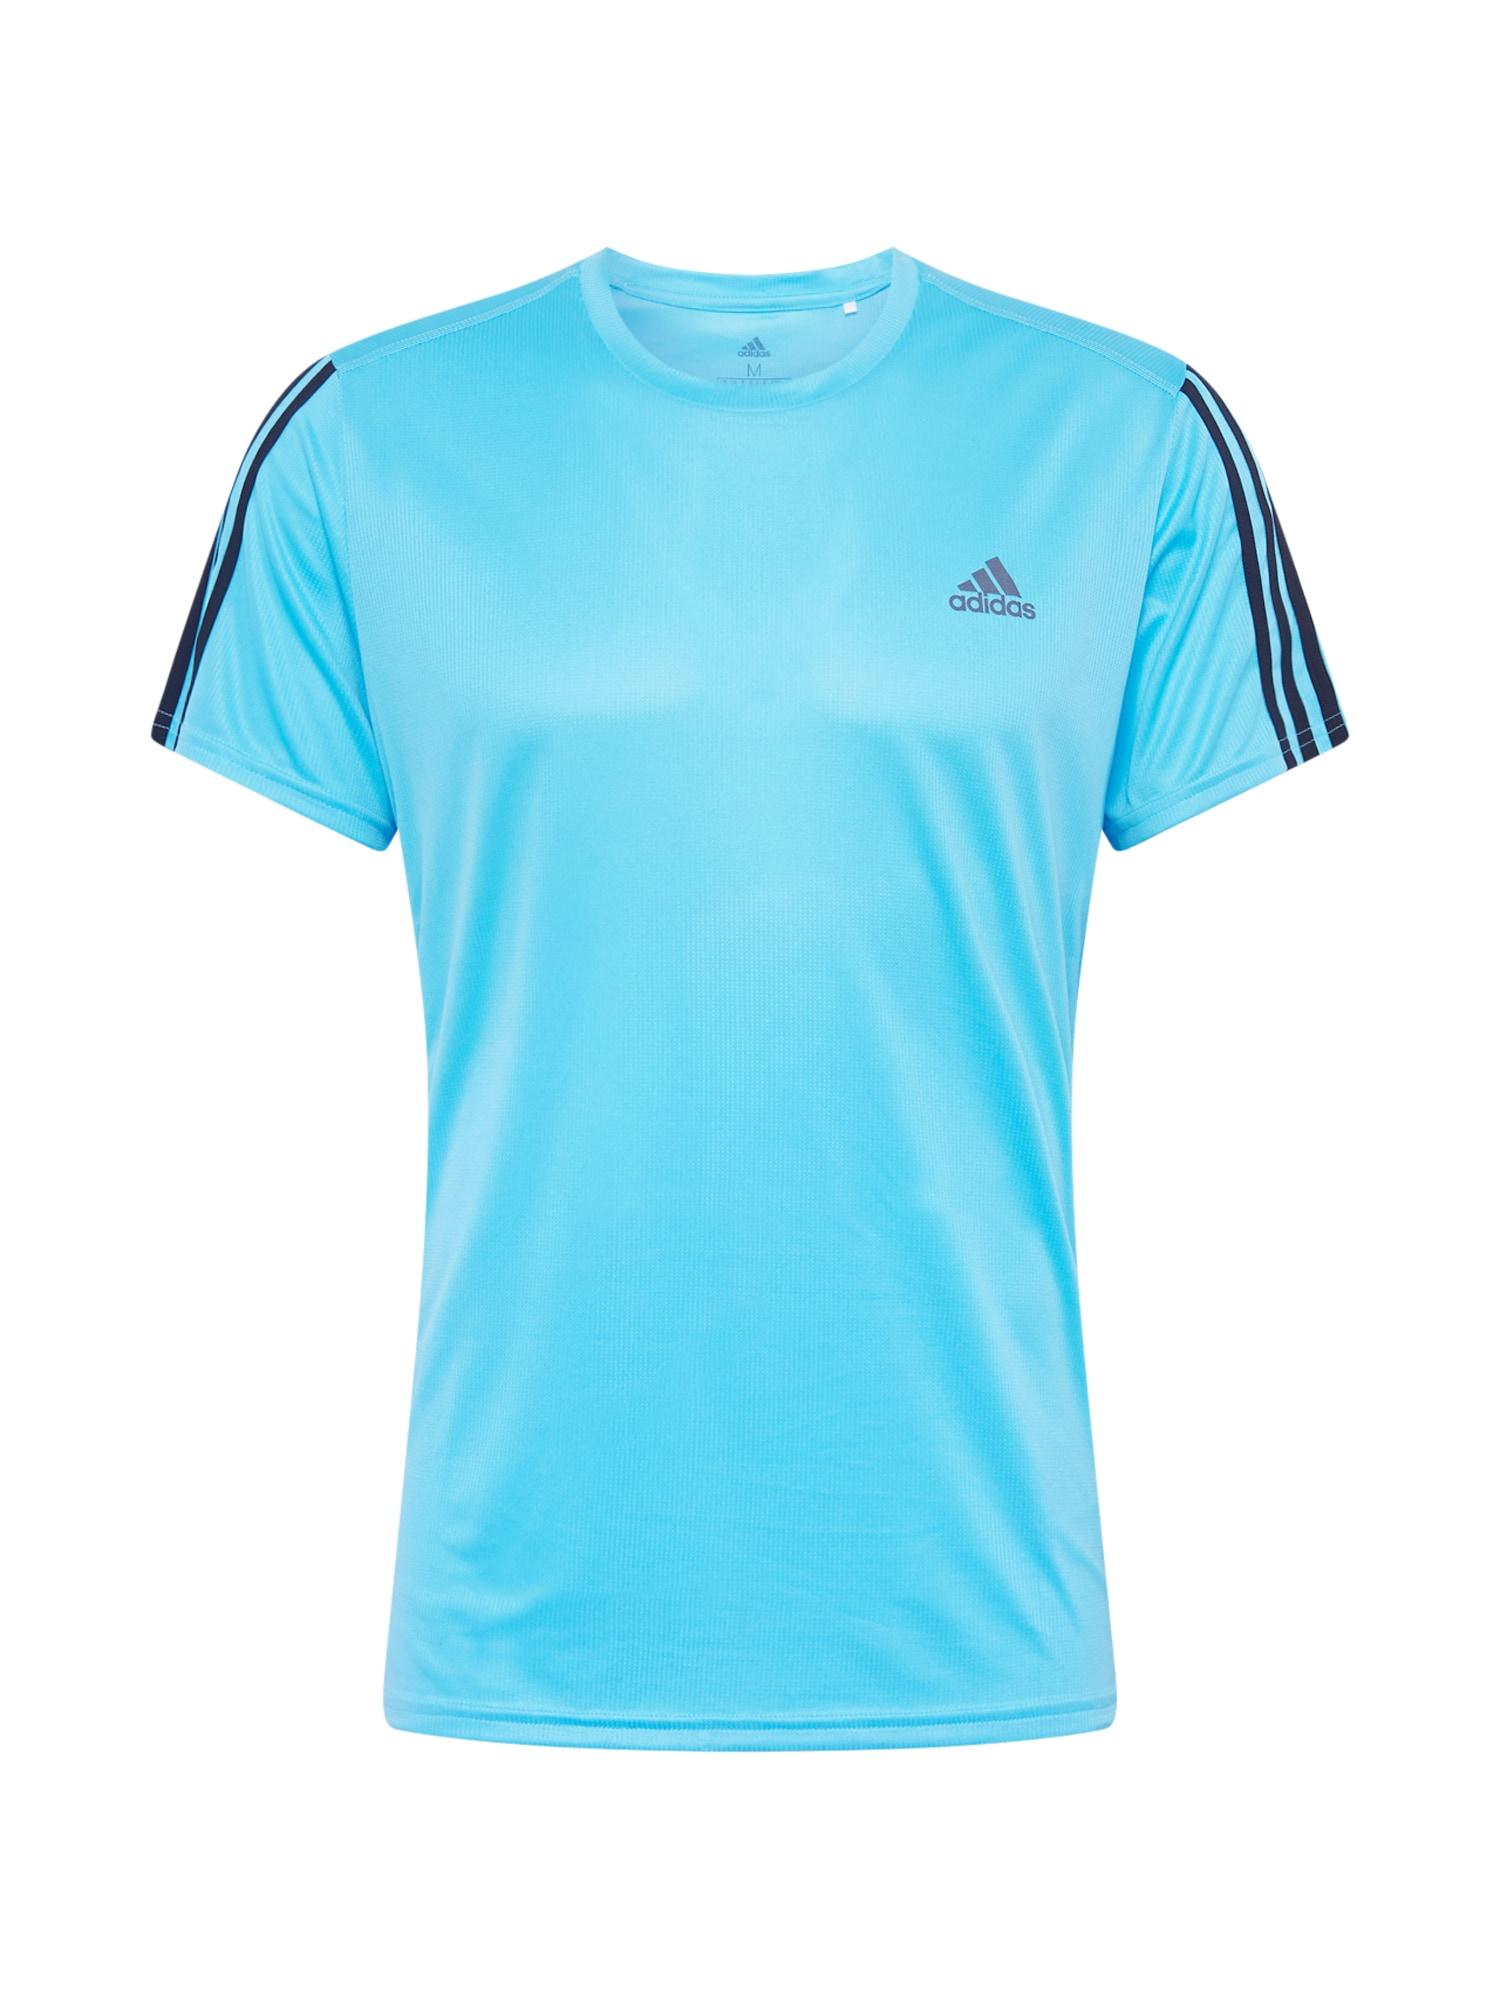 ADIDAS PERFORMANCE Funkční tričko 'Run 3S M'  azurová modrá / tmavě modrá